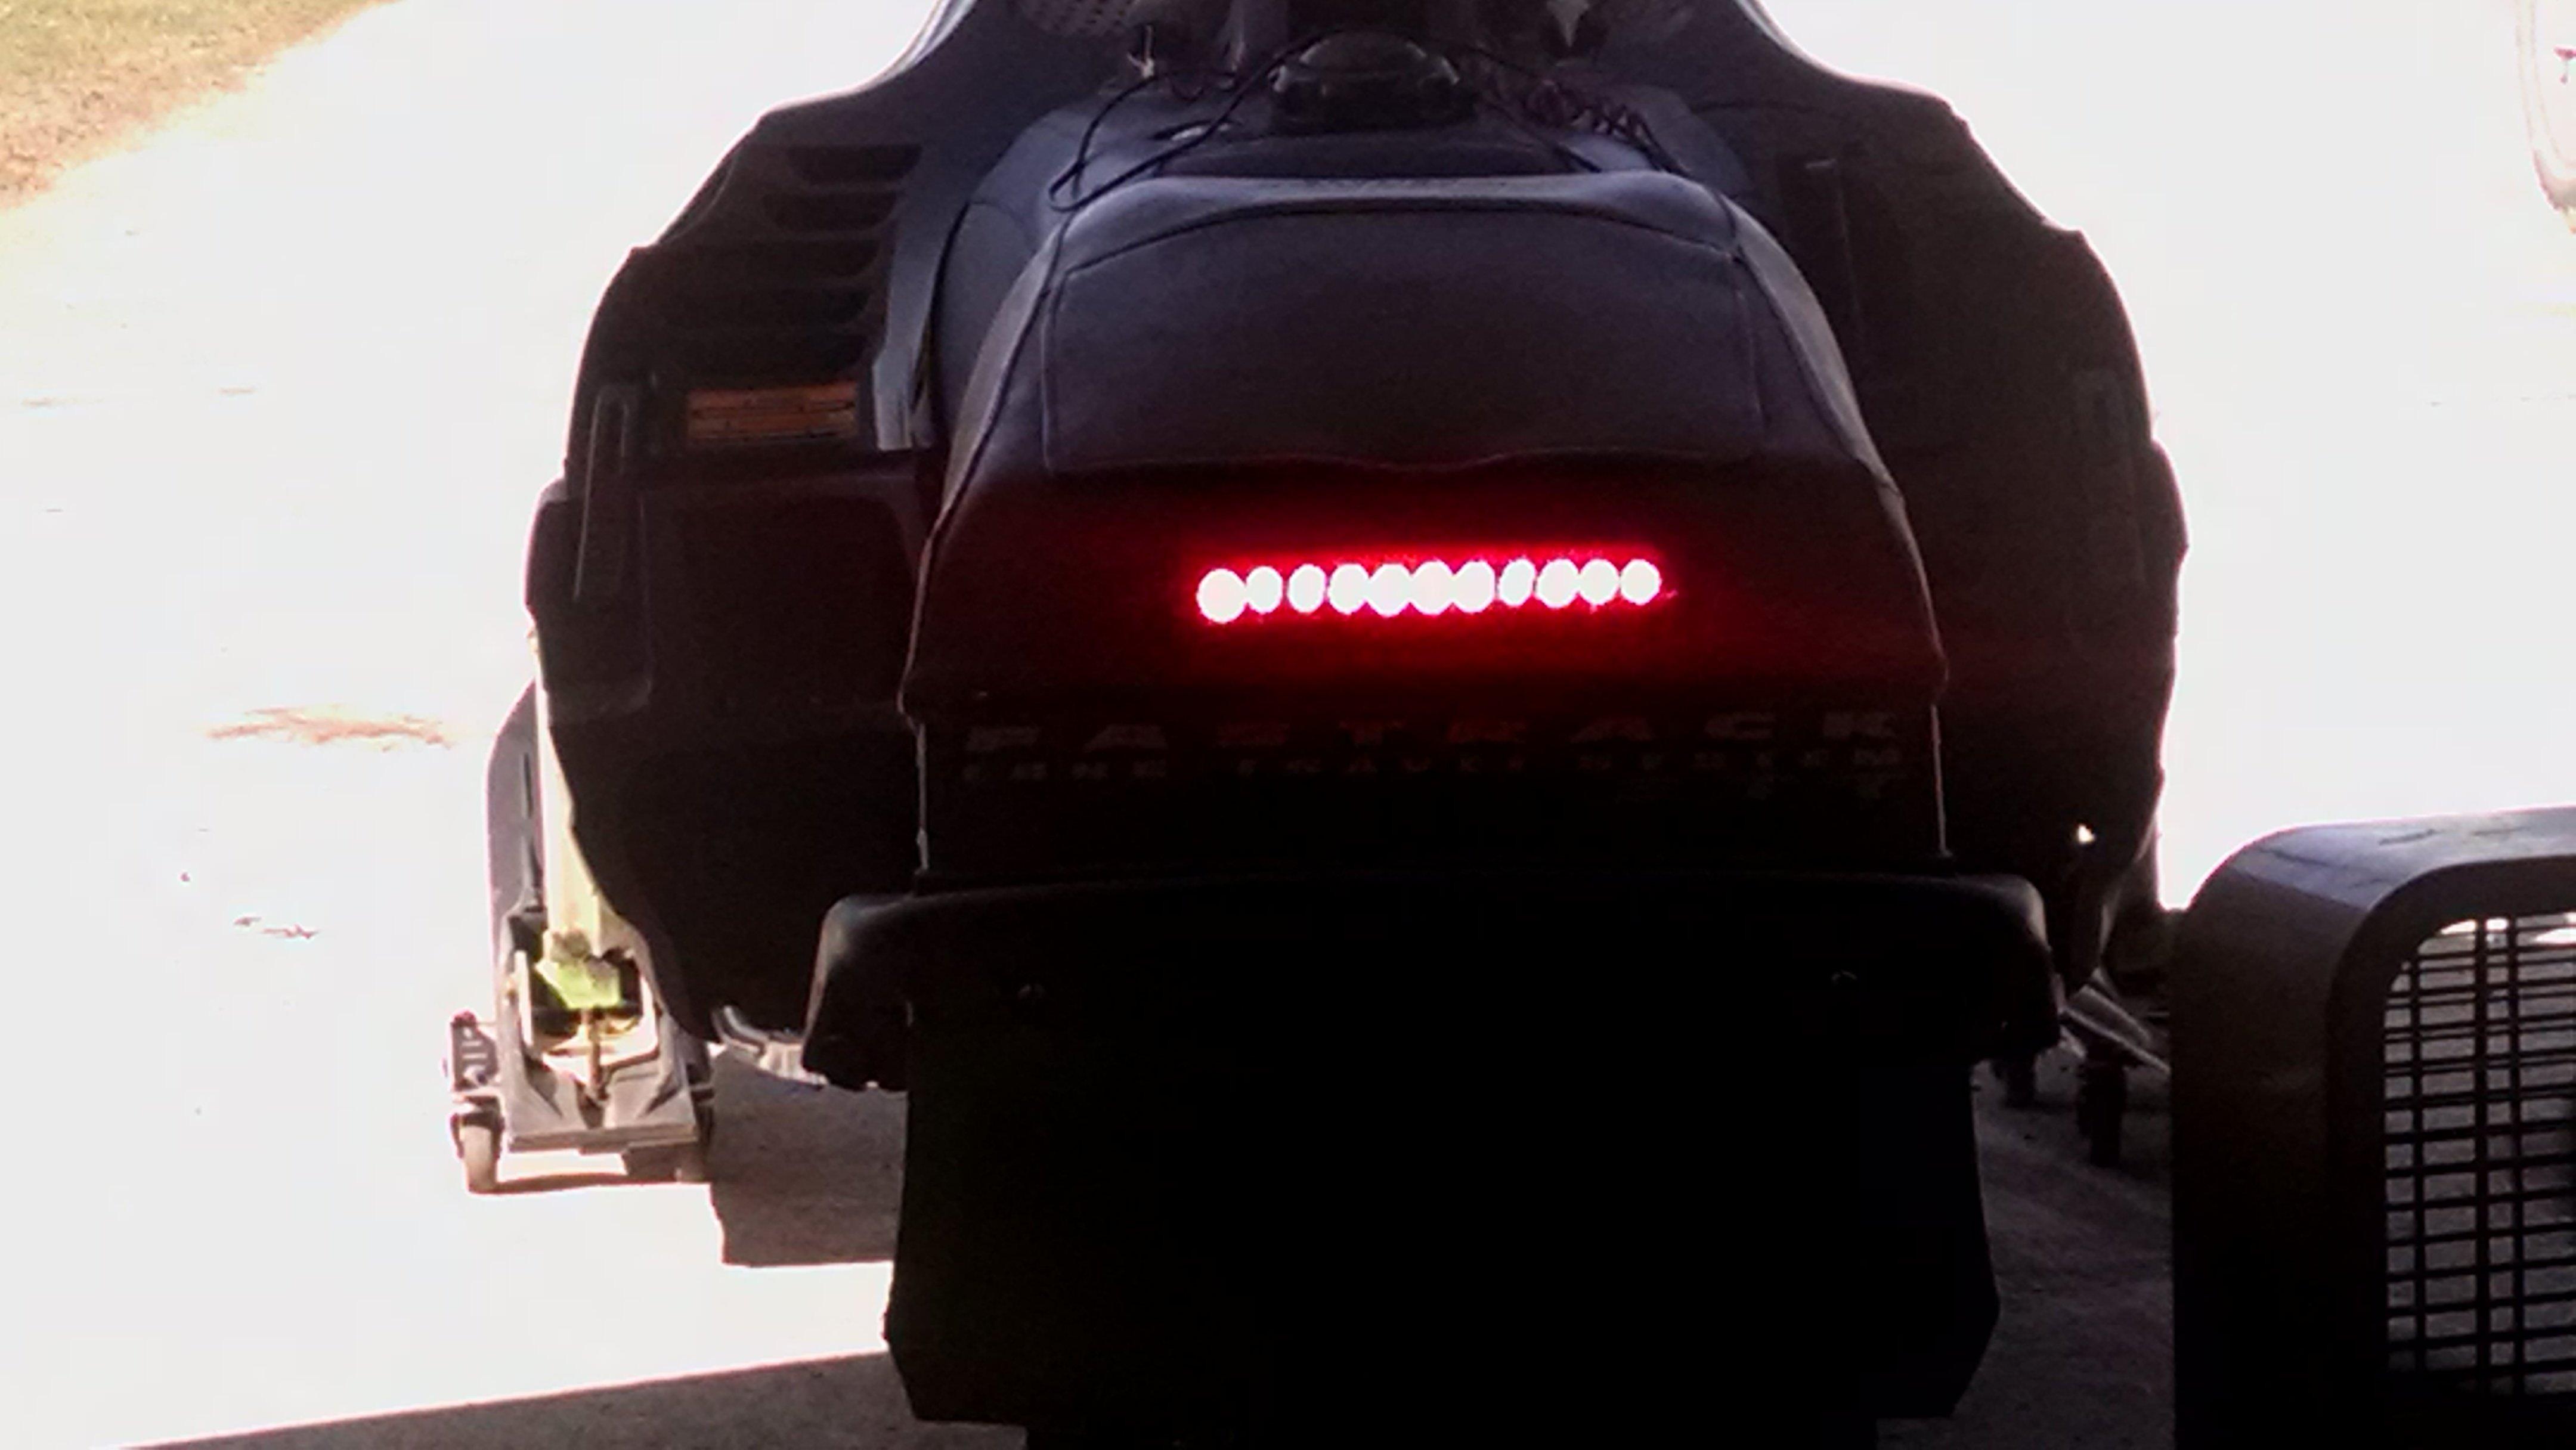 D Led Tail Light Conversion Ideas Zrt Img